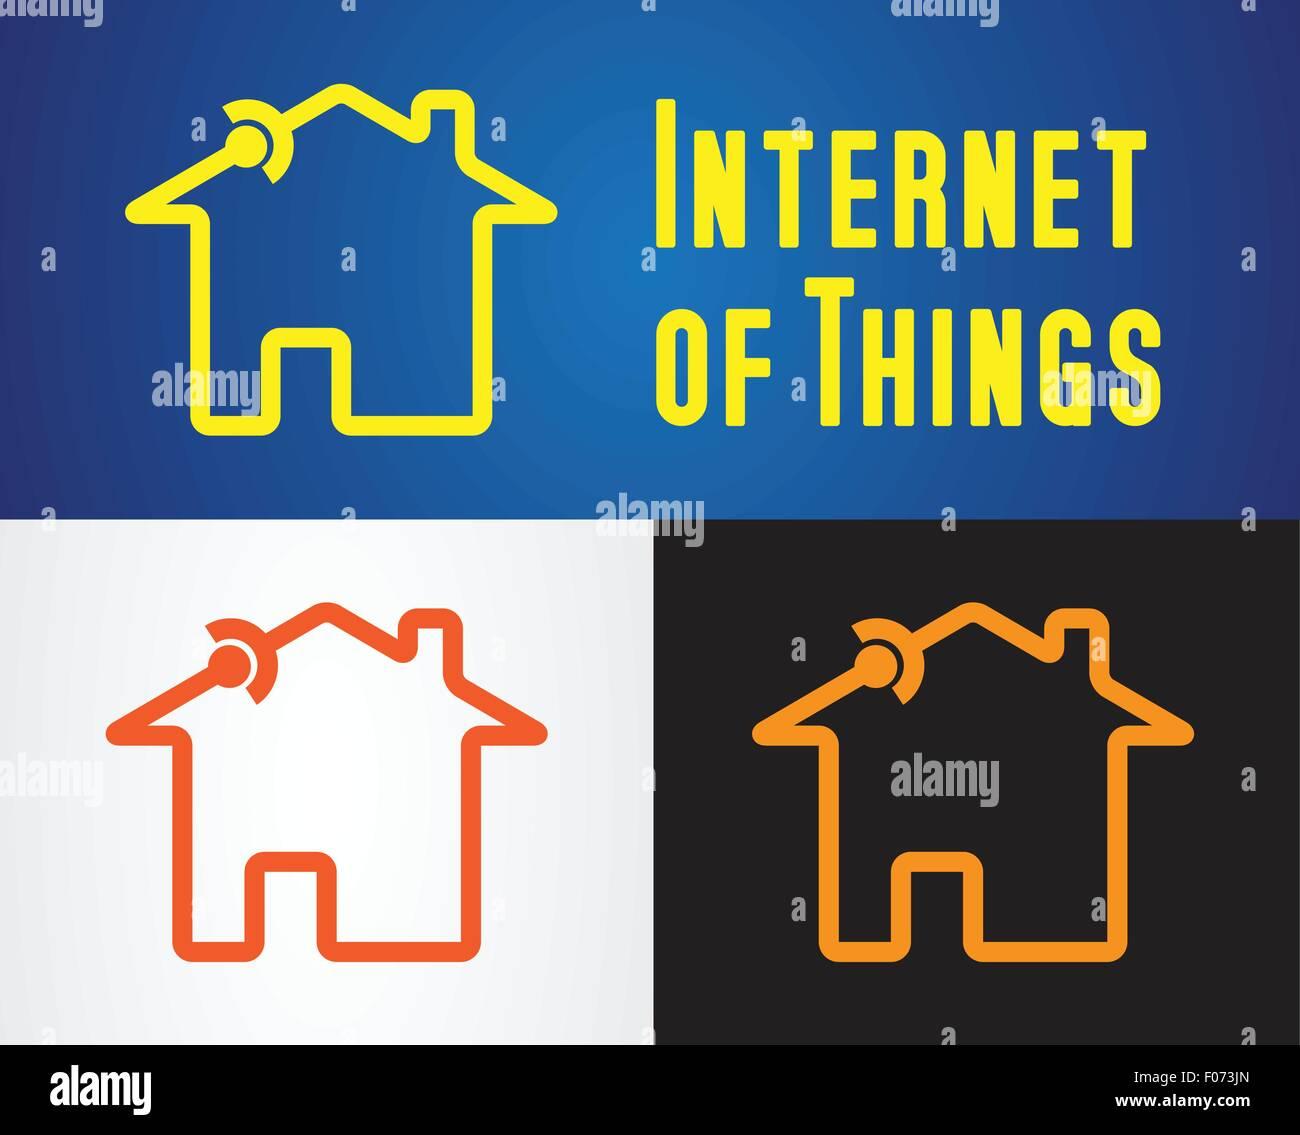 Internet Things Flat Icons Stockfotos & Internet Things Flat Icons ...